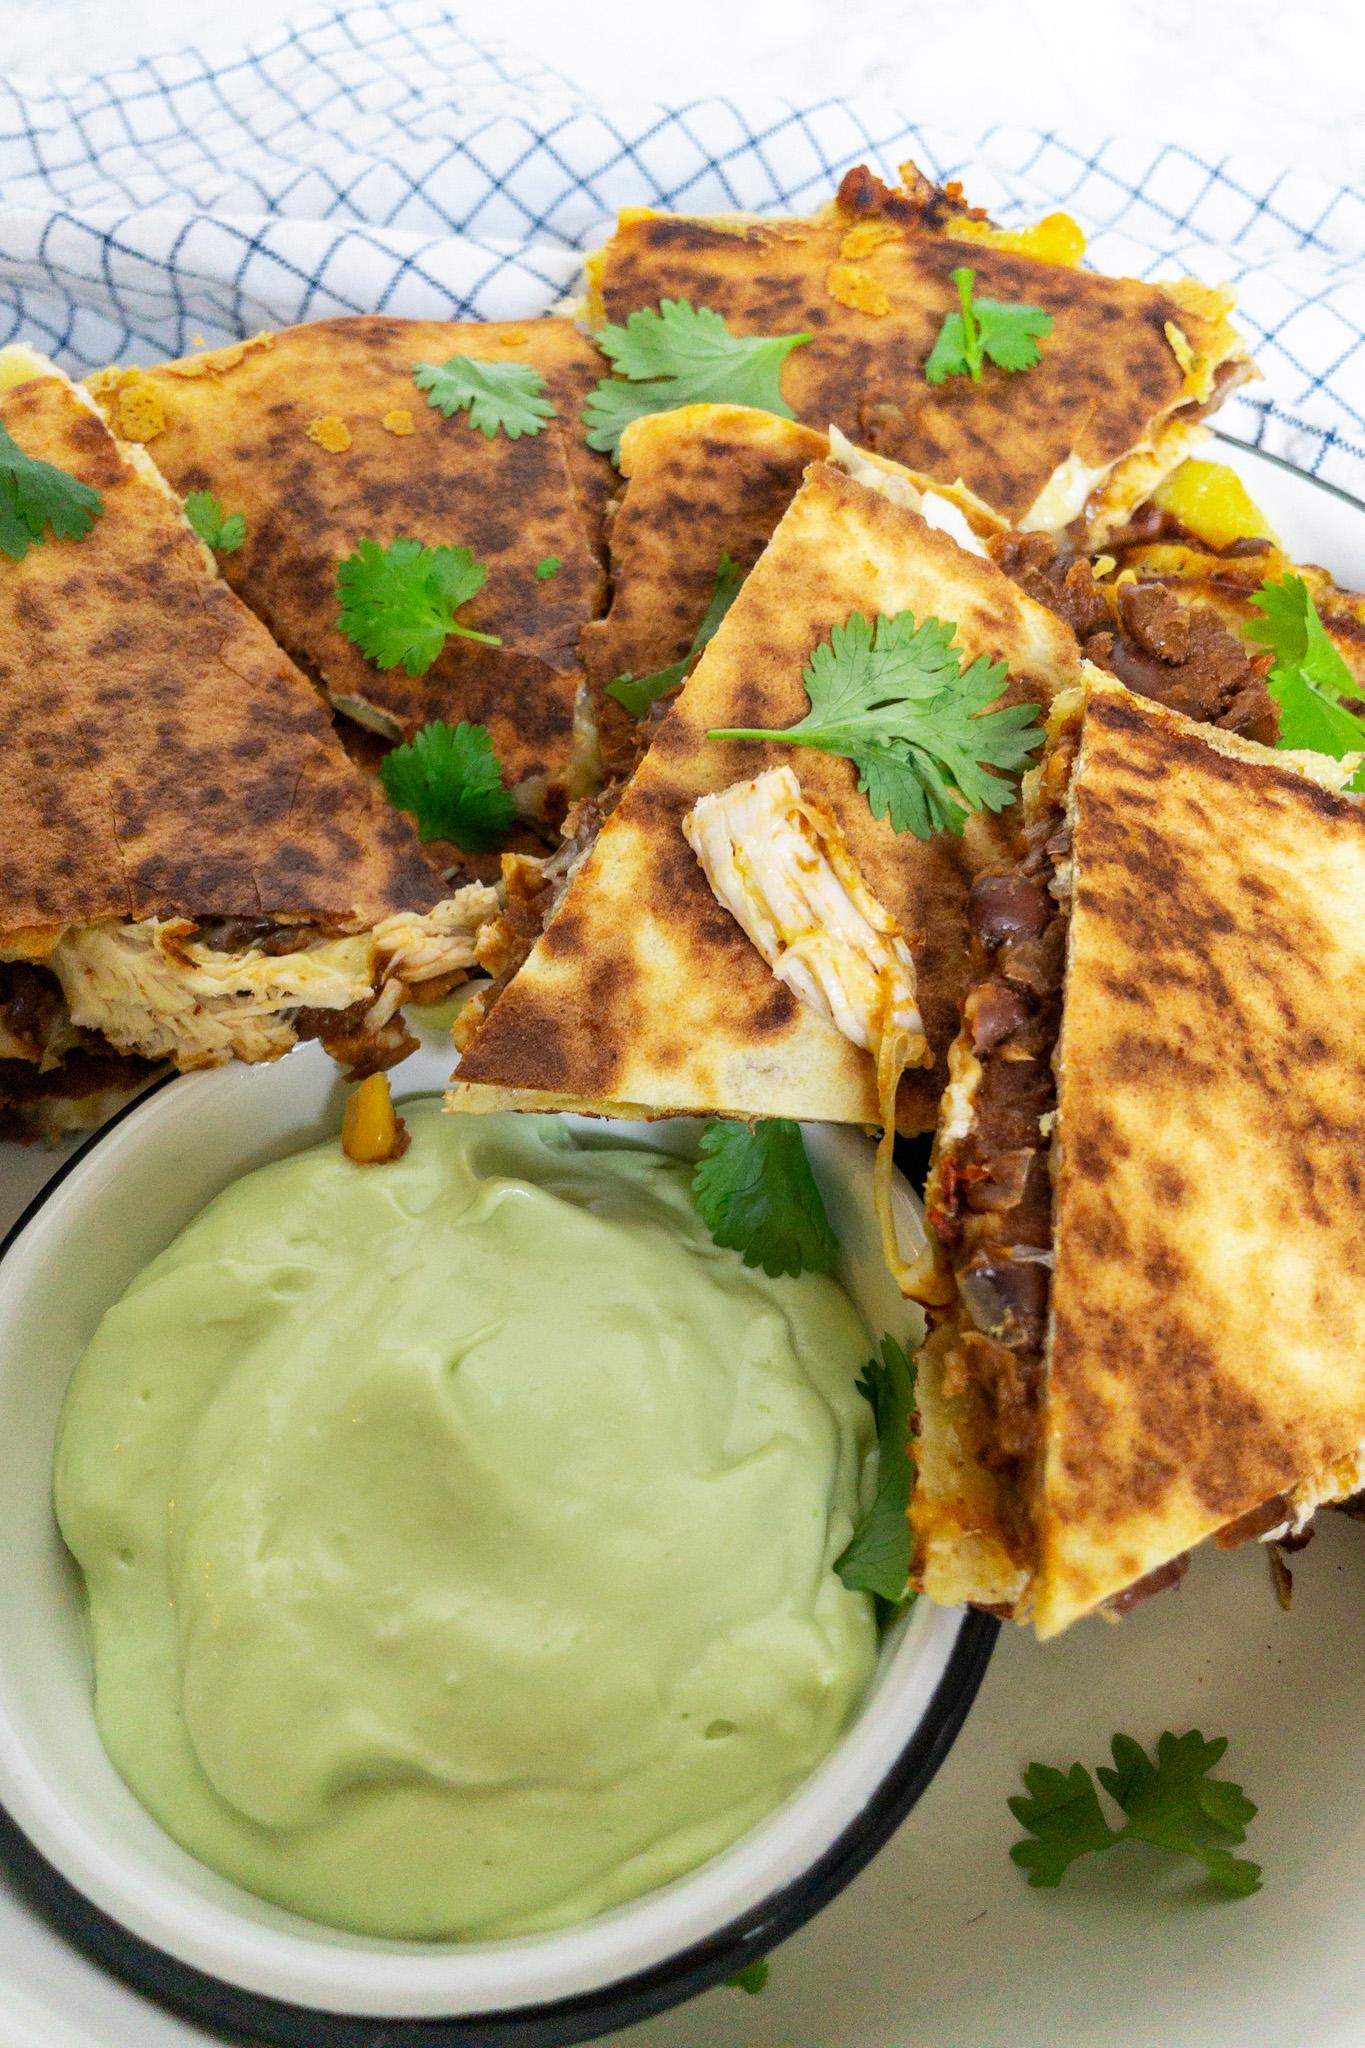 Quesadilla's met kip en chili